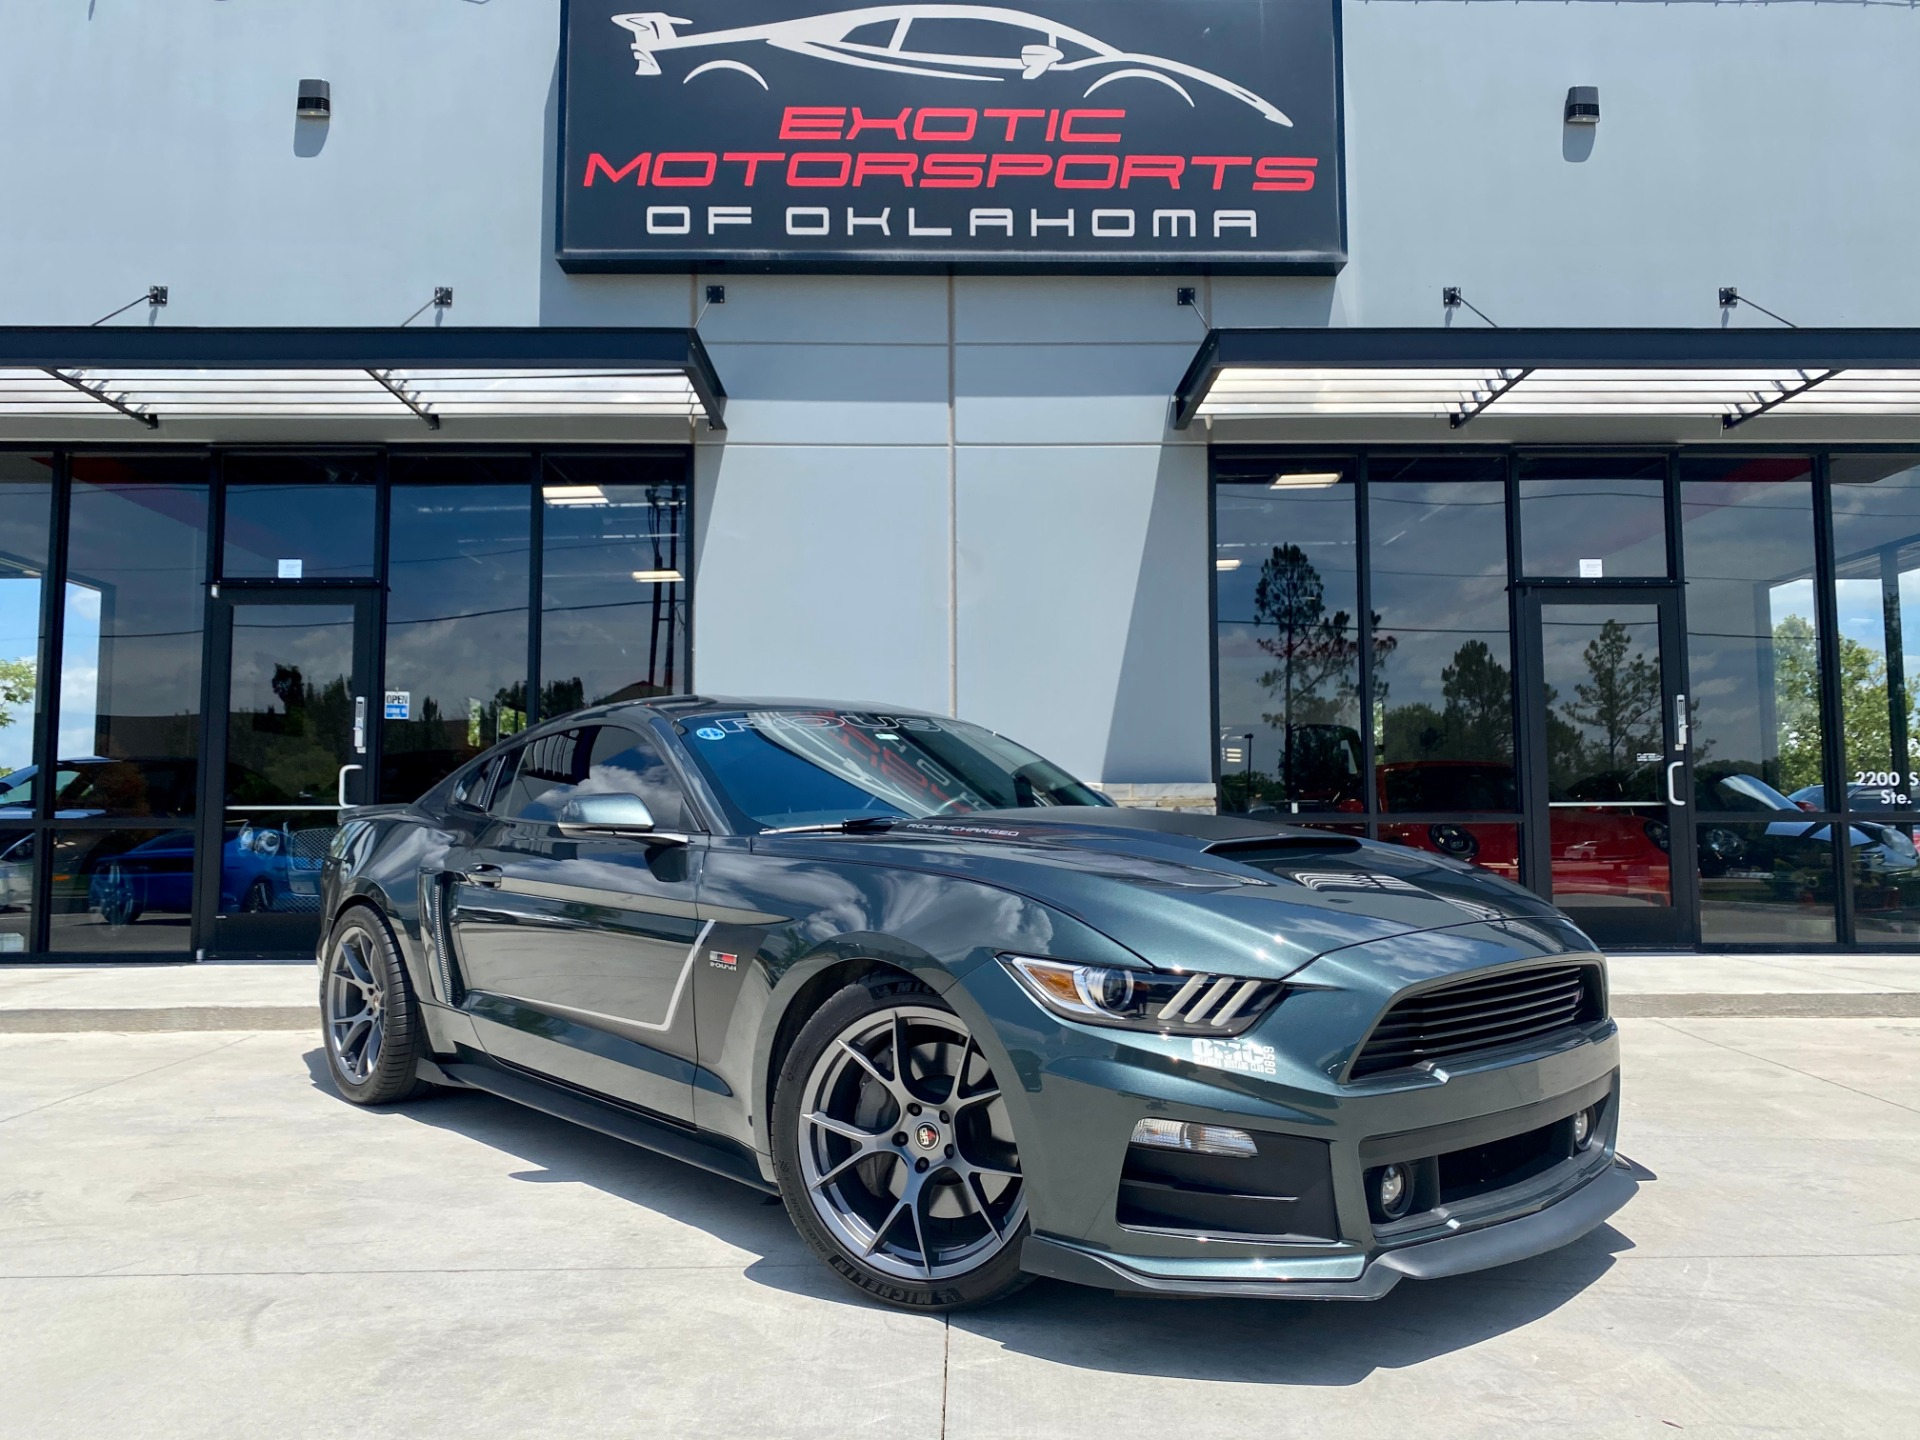 2015 Roush Mustang For Sale